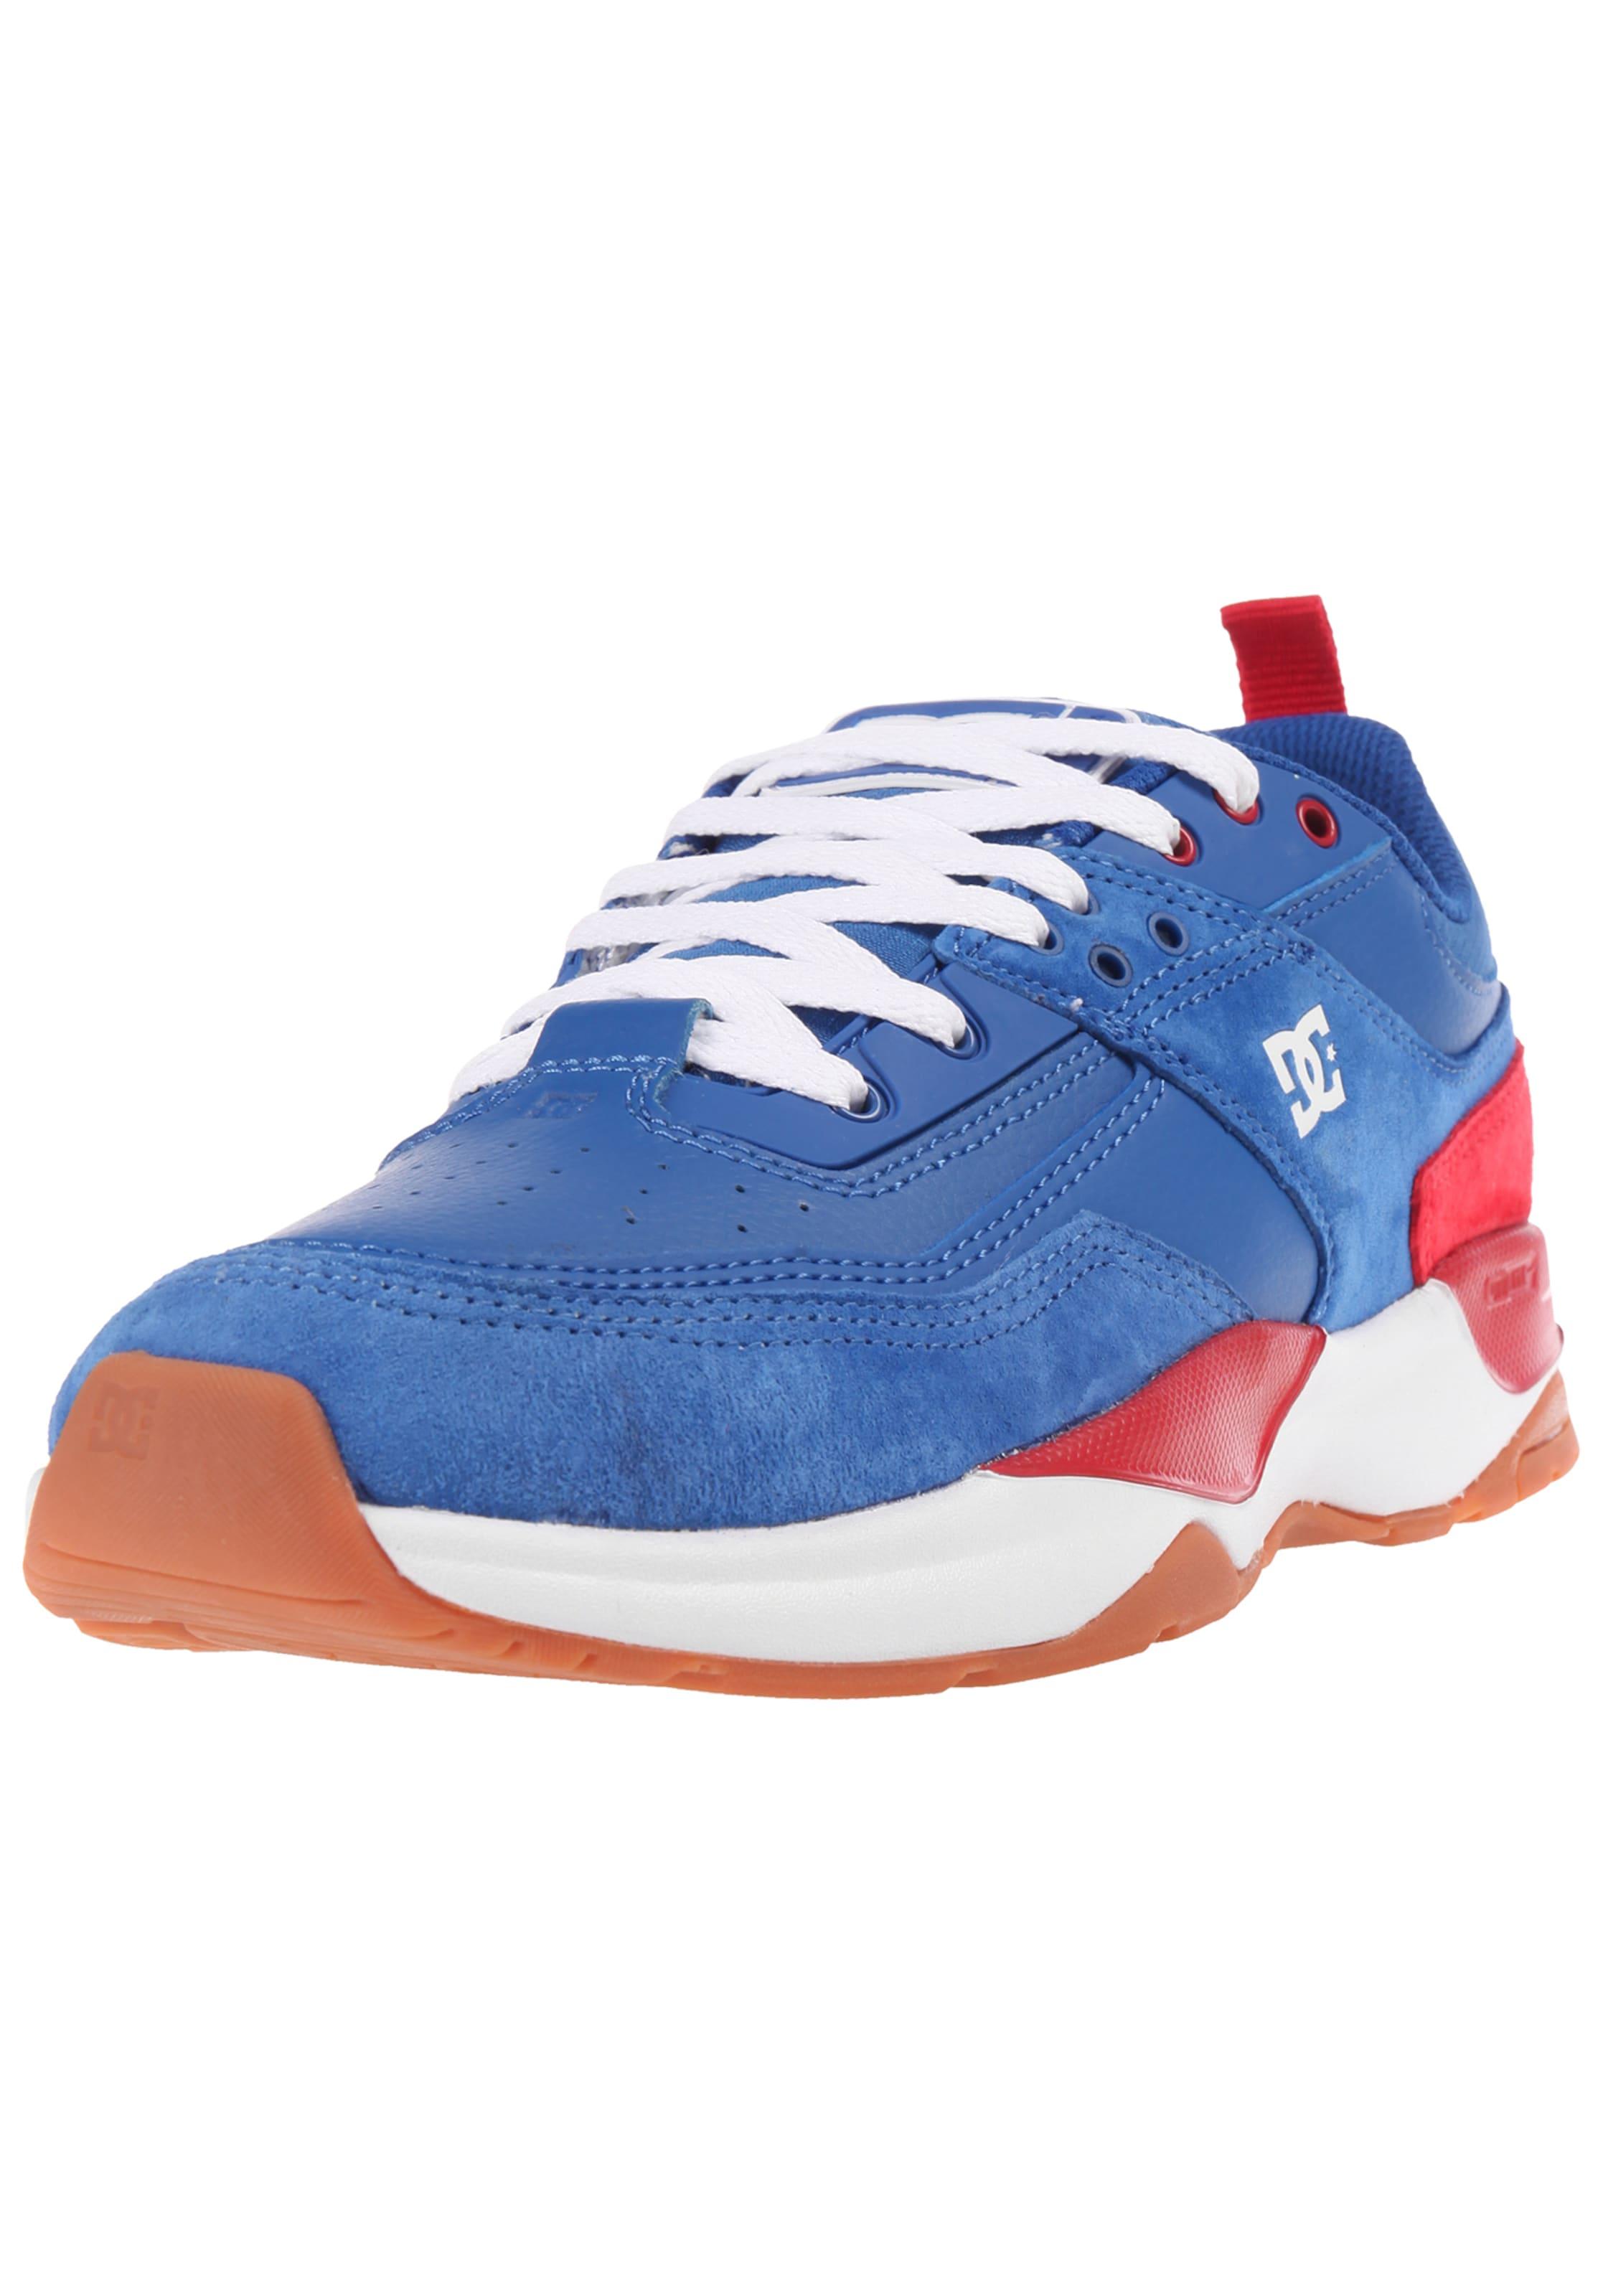 Dc In BlauRot Weiß Sneaker Shoes kuOZPXi